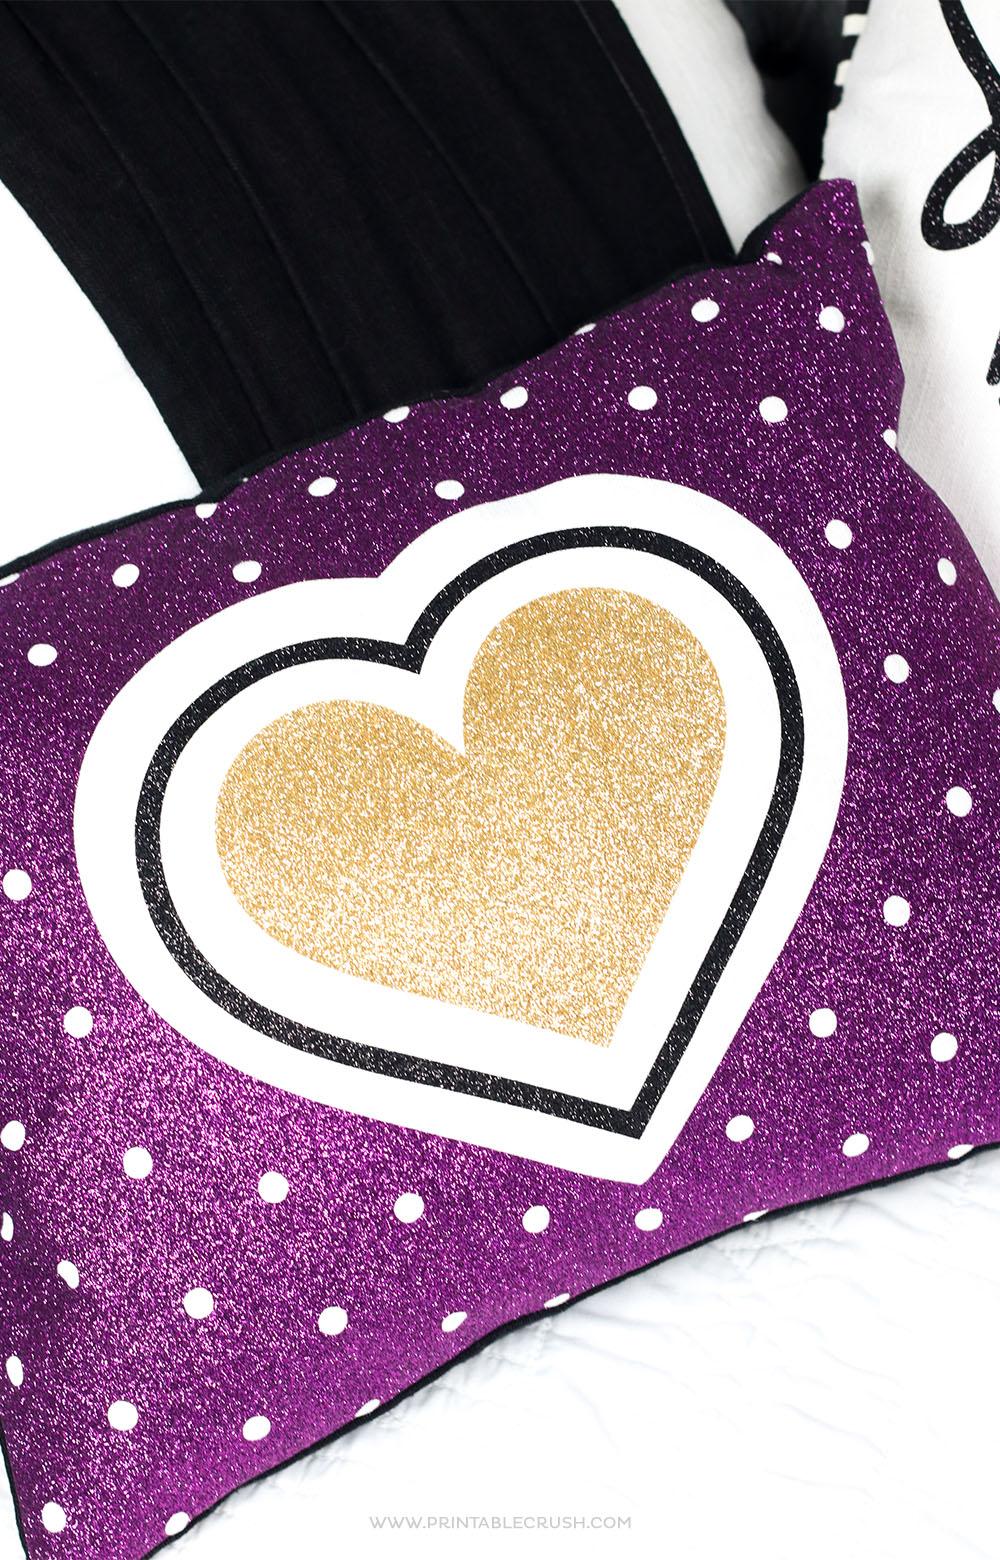 Use the Cricut EasyPress 2 to make these fun Glitter Iron-On Pillows